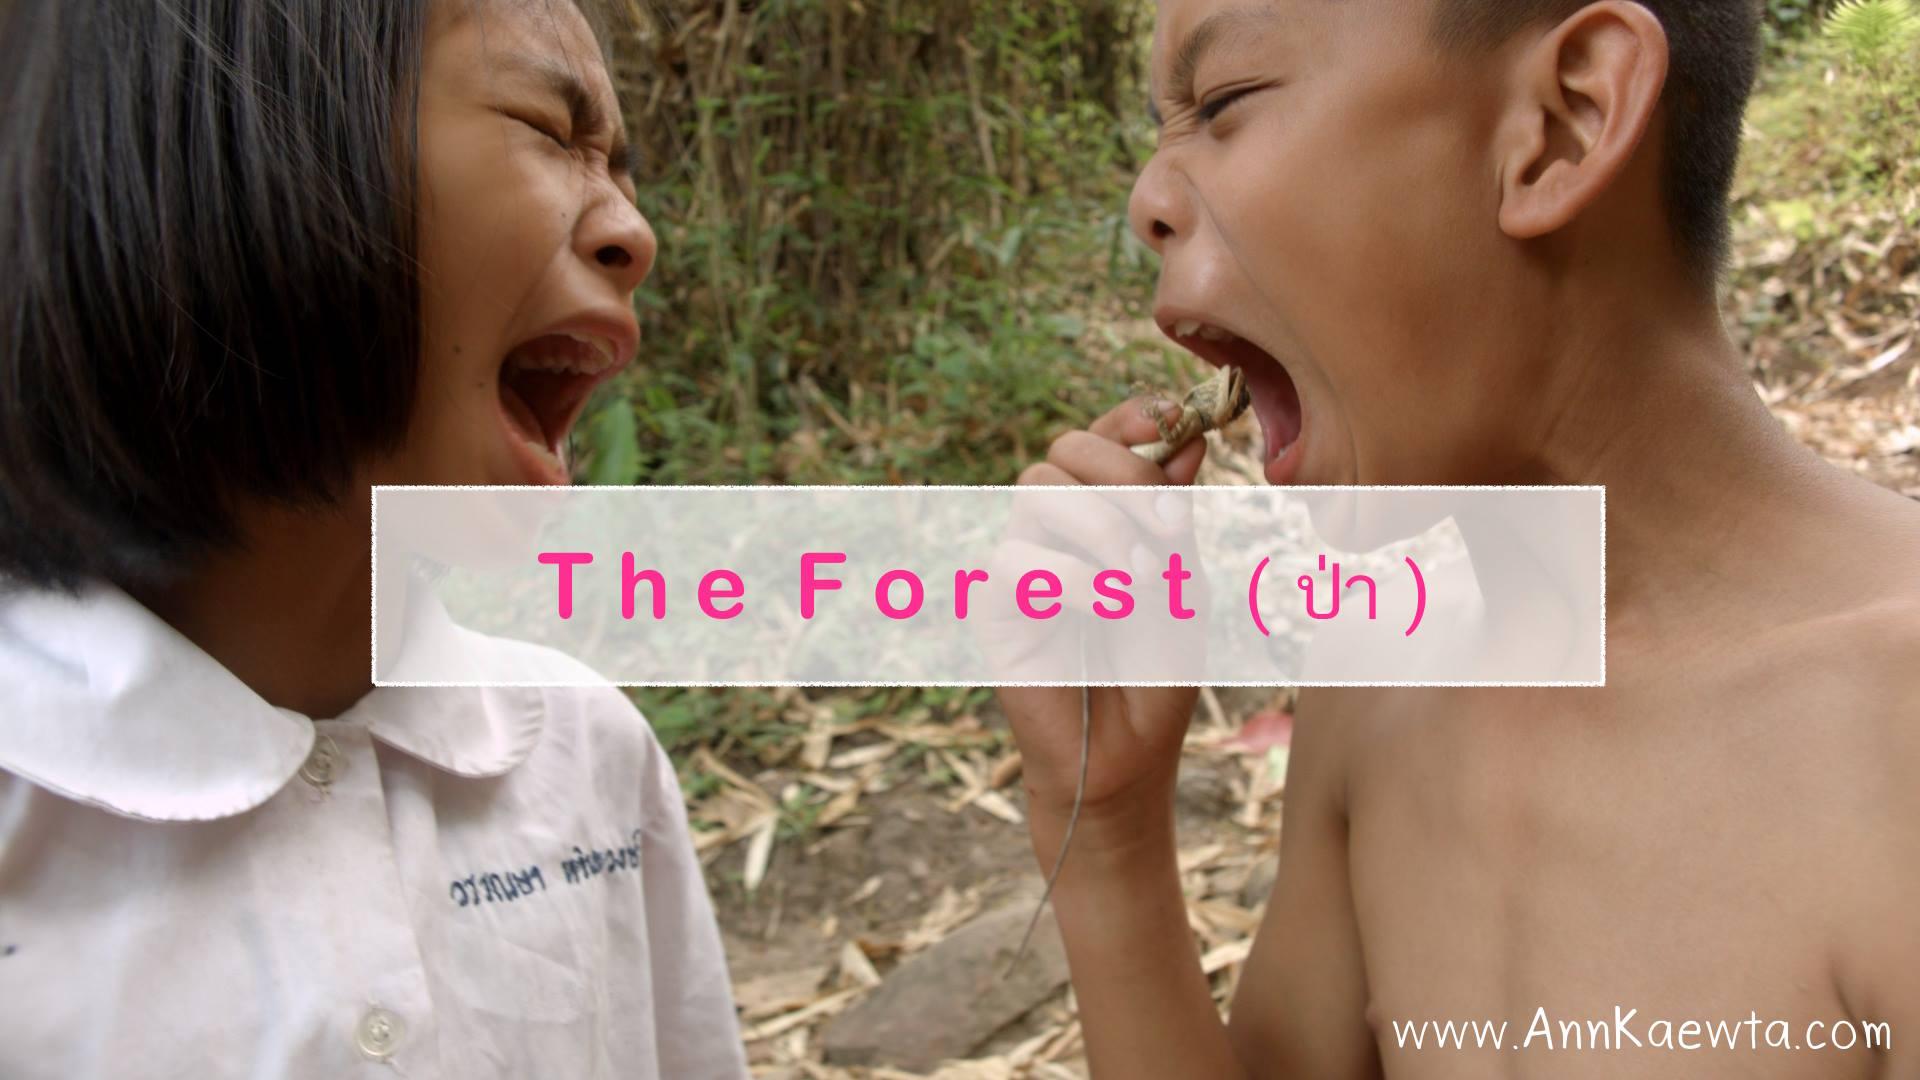 Photo: www.facebook.com/theforestthefilm